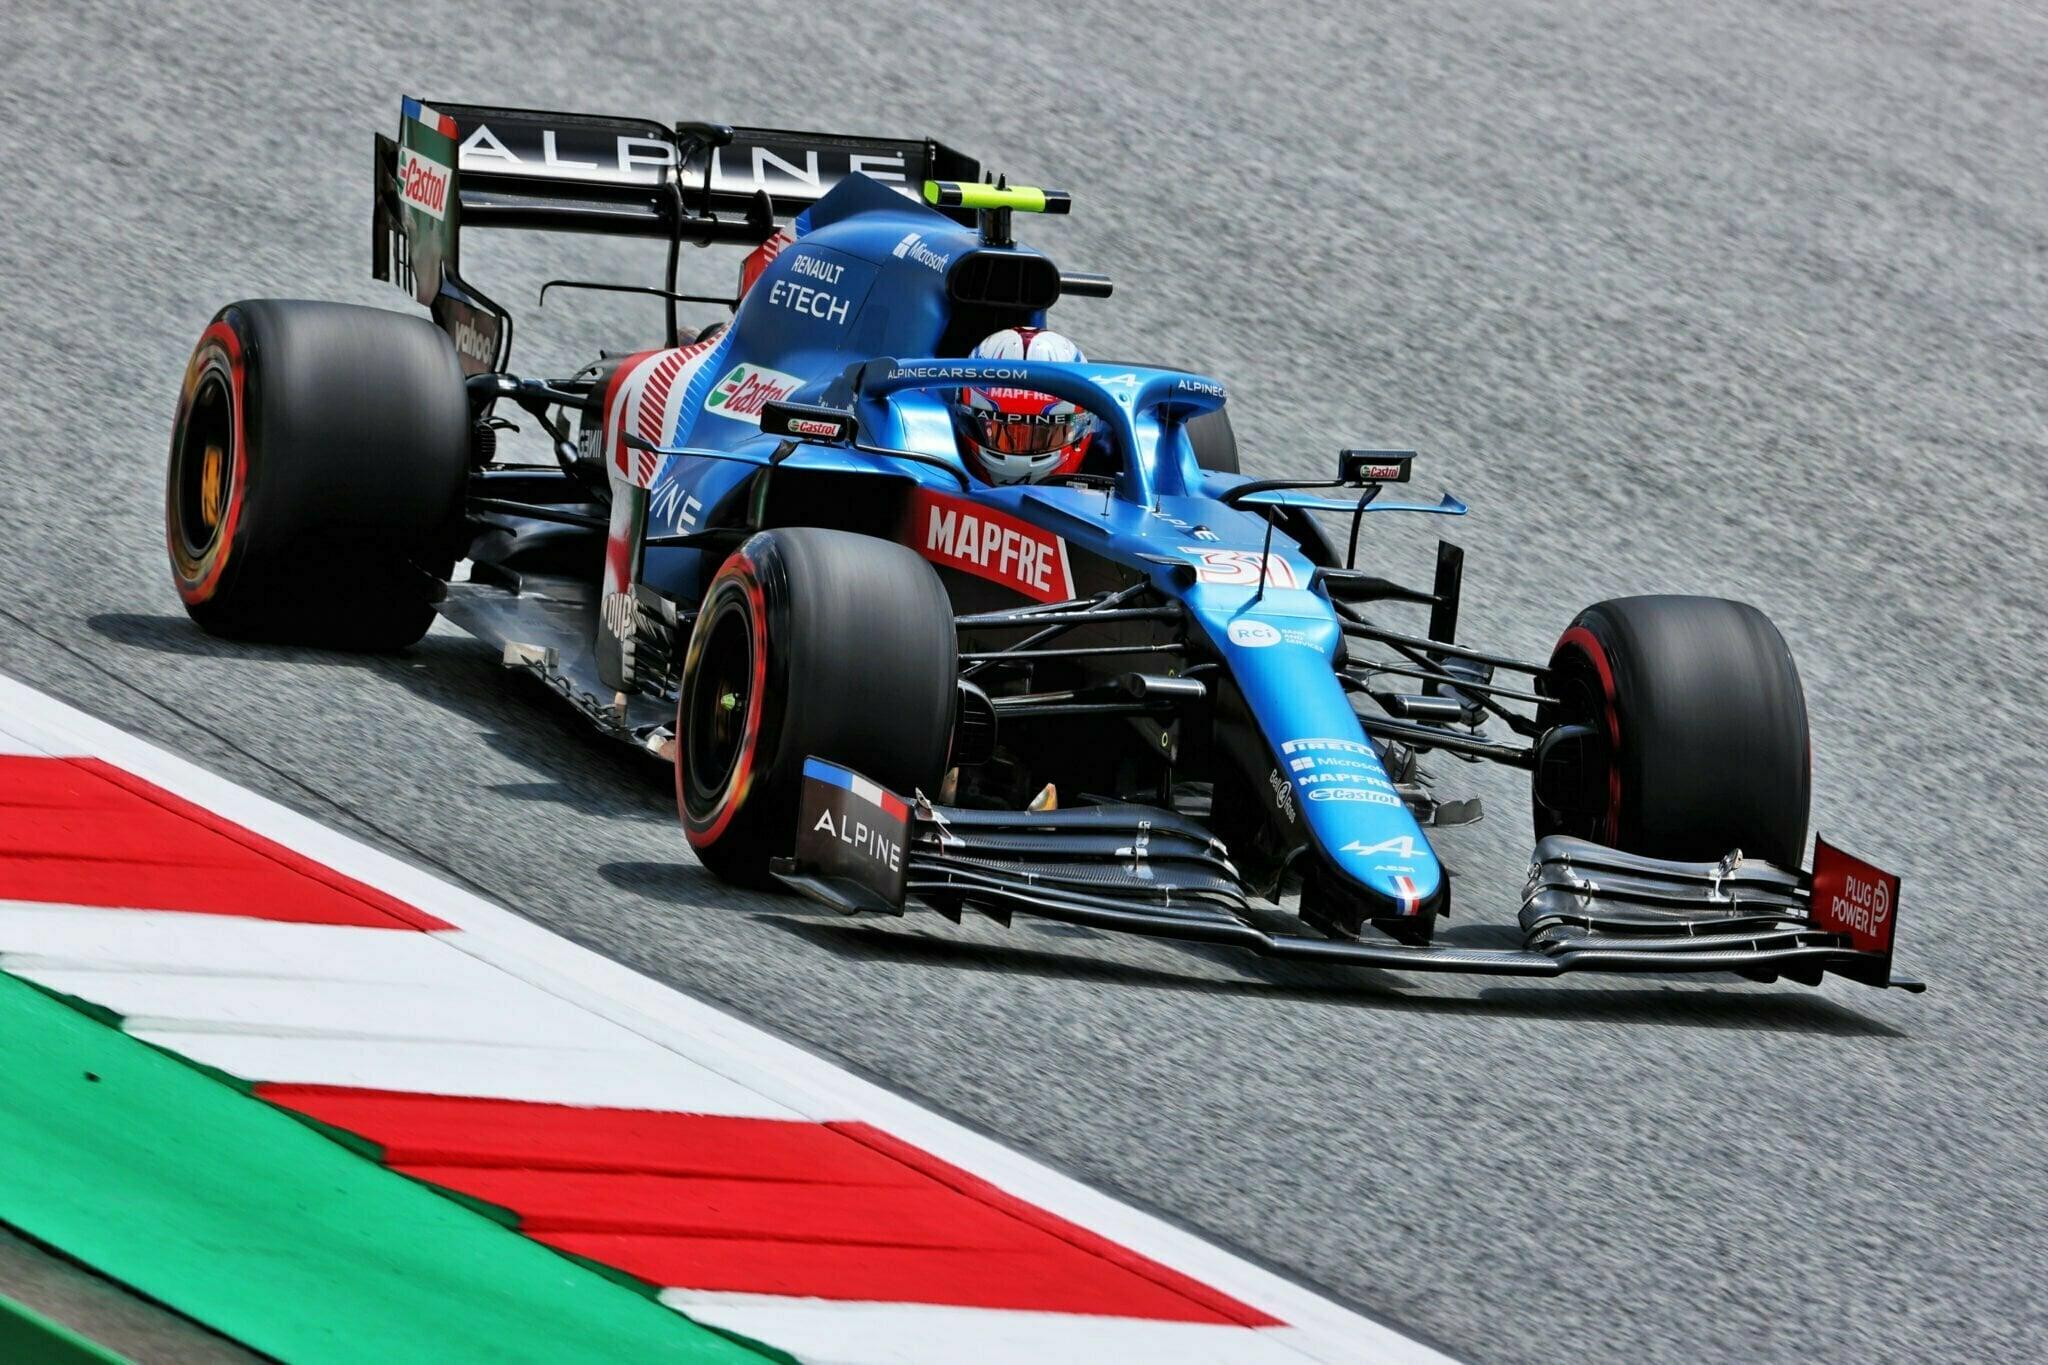 Alpine F1 Team Alonso Ocon Autriche Steiermark Grand Prix Spielberg A521 2021 20 | Alpine F1 : Alonso rapporte deux points au Grand Prix BWT de Styrie